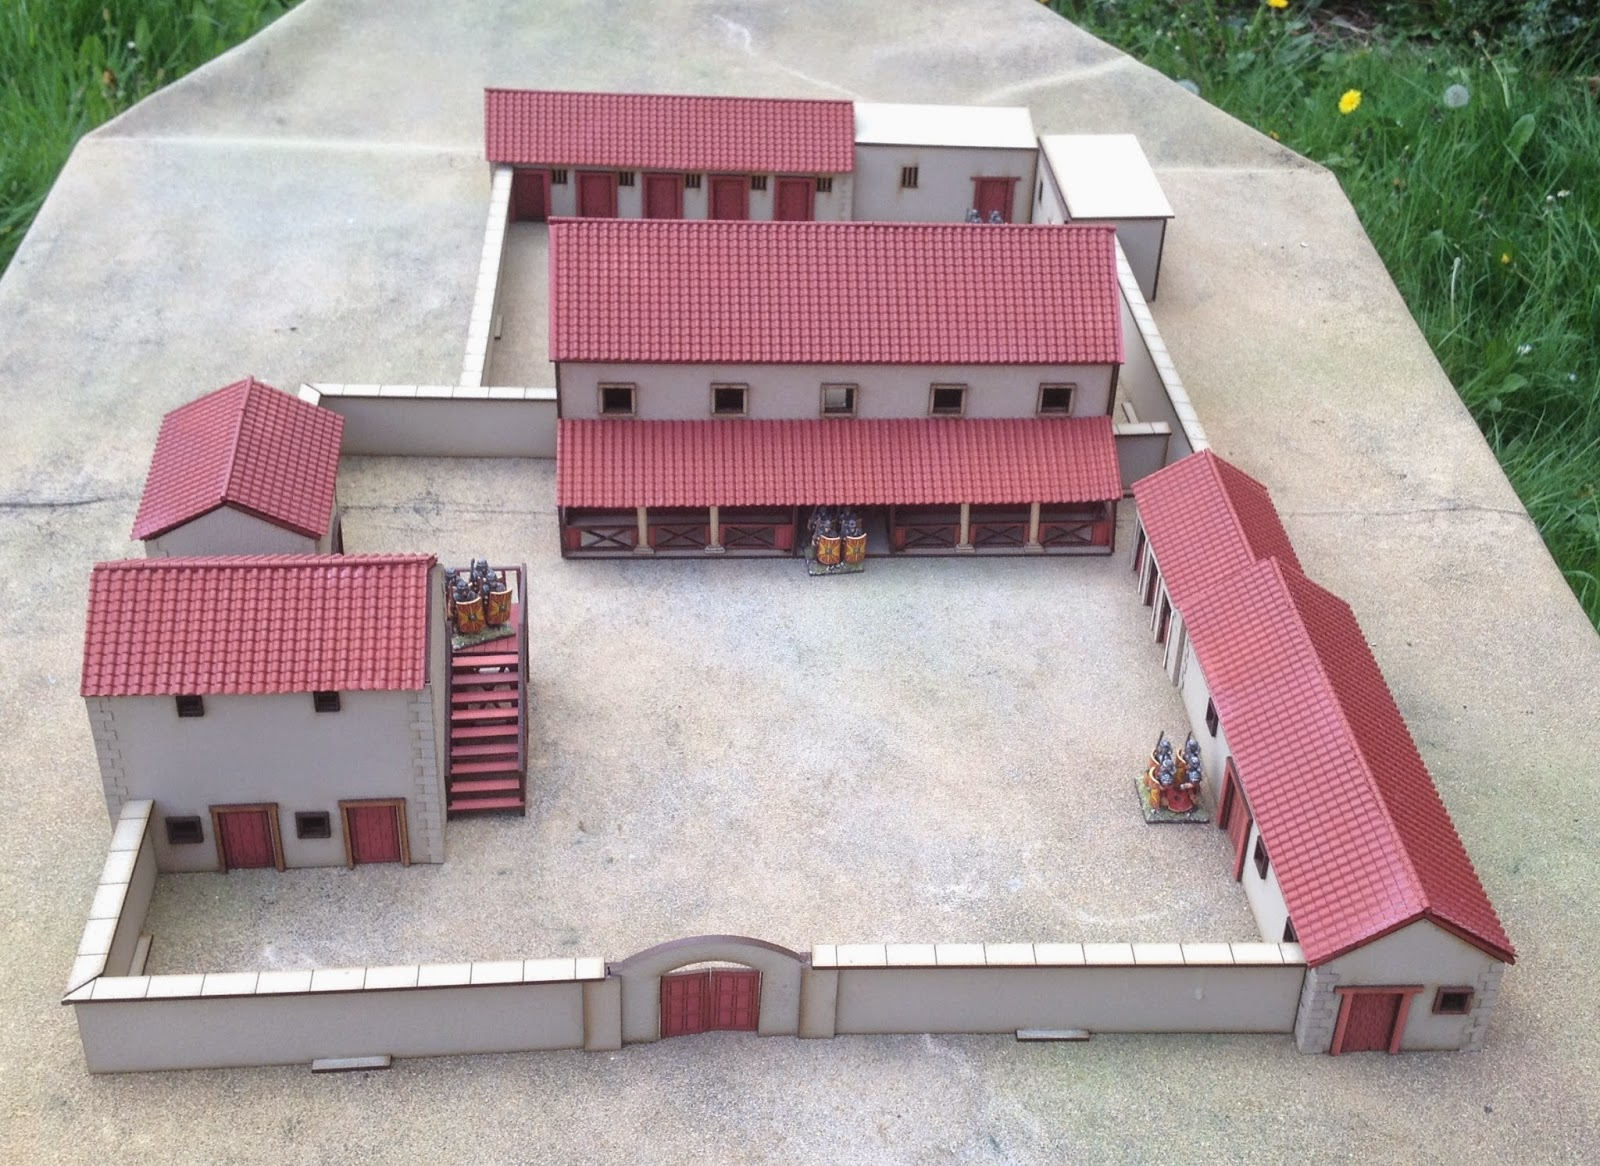 Roman Villa Floor Plan Lock Up Your Sheep 28mm Roman Villa And Ludus